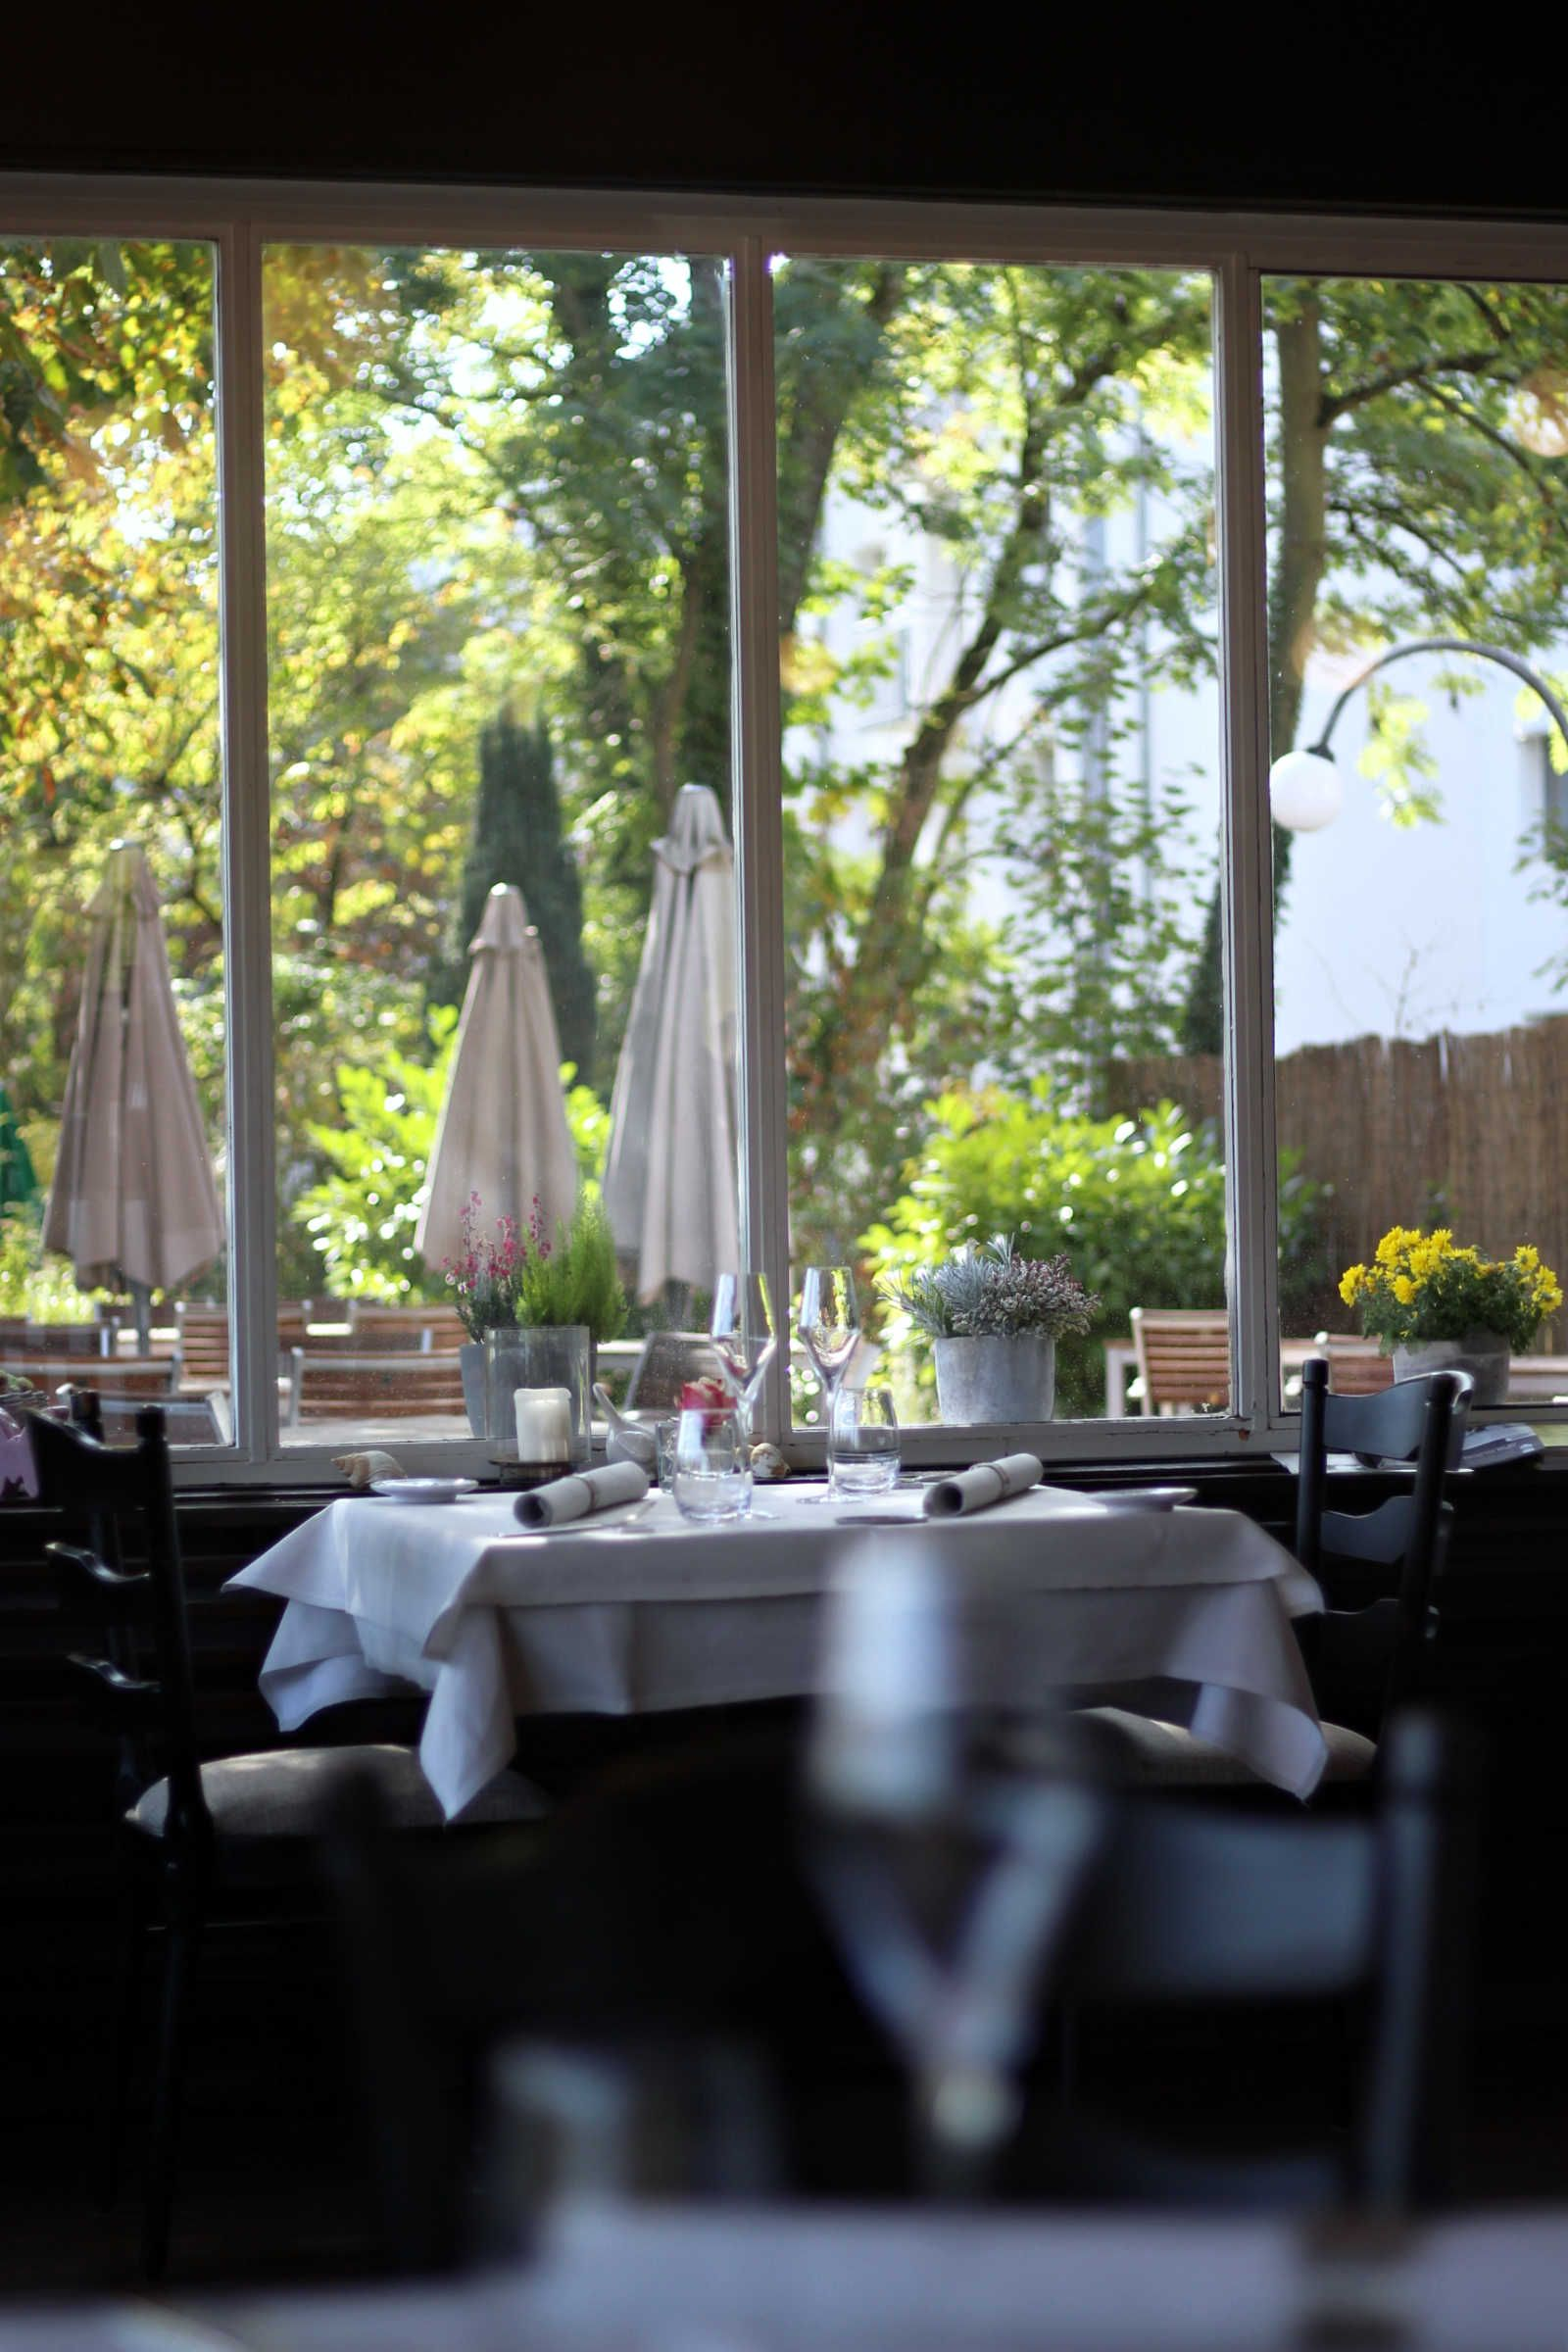 Gute Restaurants In Karlsruhe